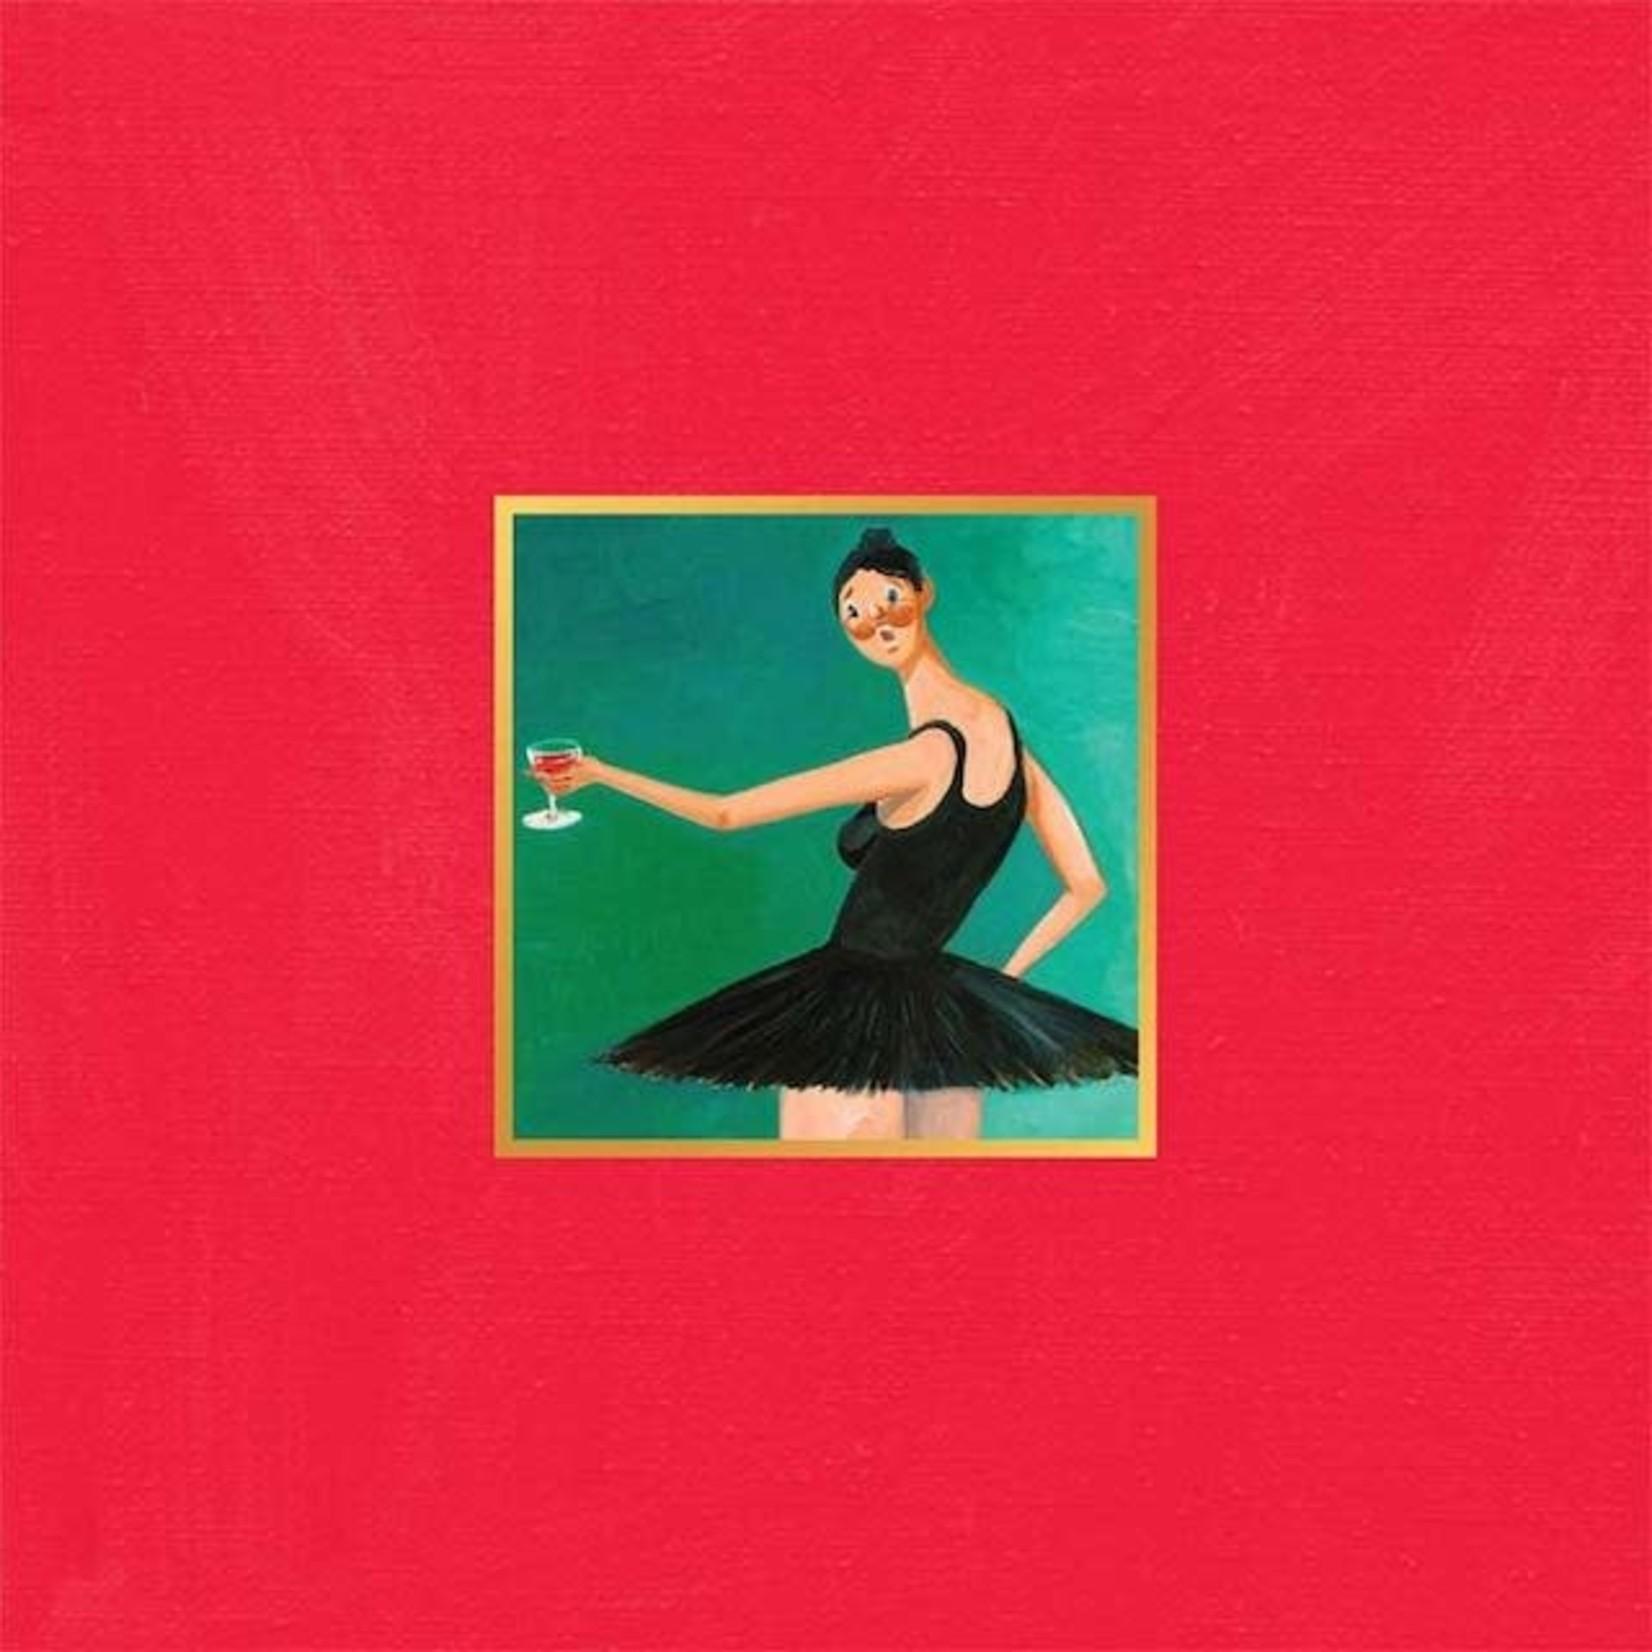 Vinyl Kanye West - My Beautiful Dark Twisted Fantasy